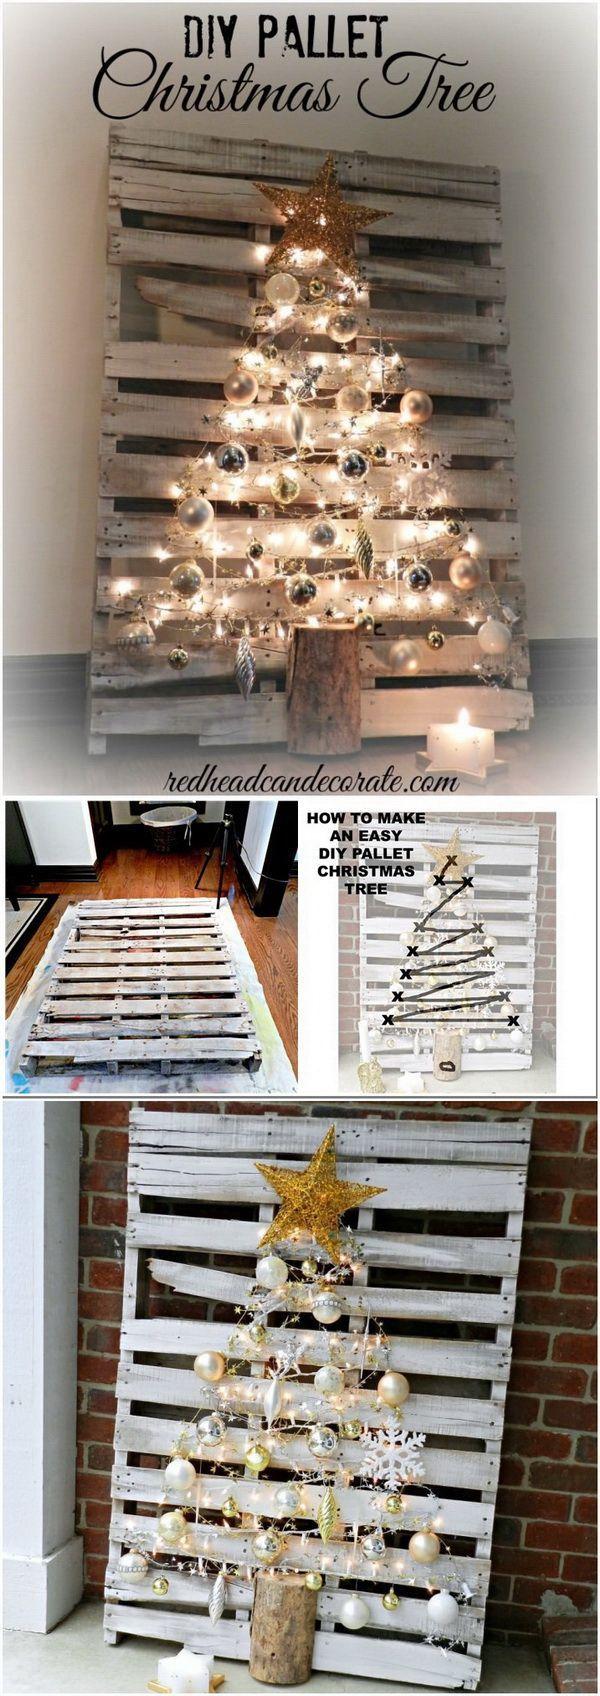 Best 25+ Pallet projects christmas ideas on Pinterest ...